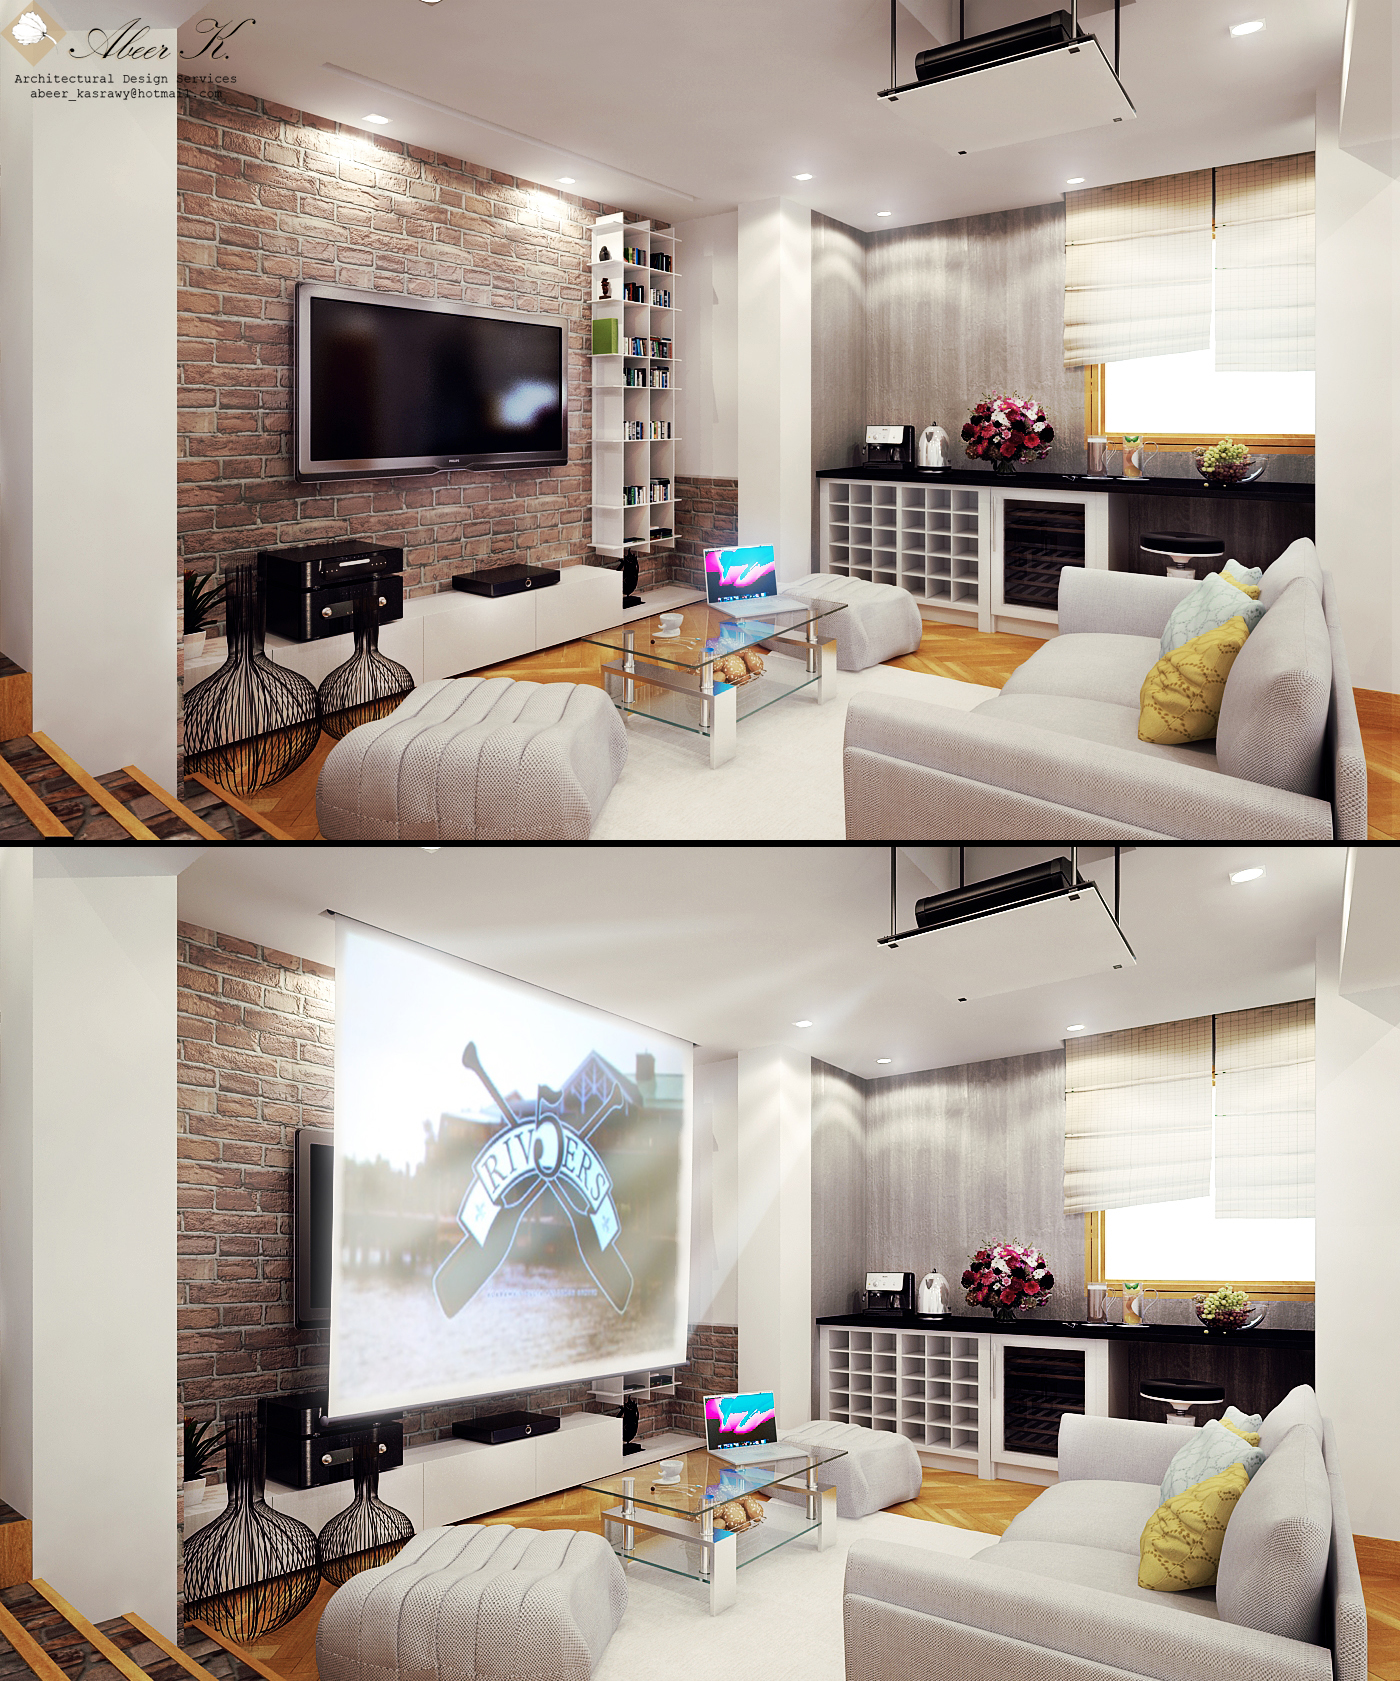 Modern Apartment Master Bedroom By Kasrawy On Deviantart